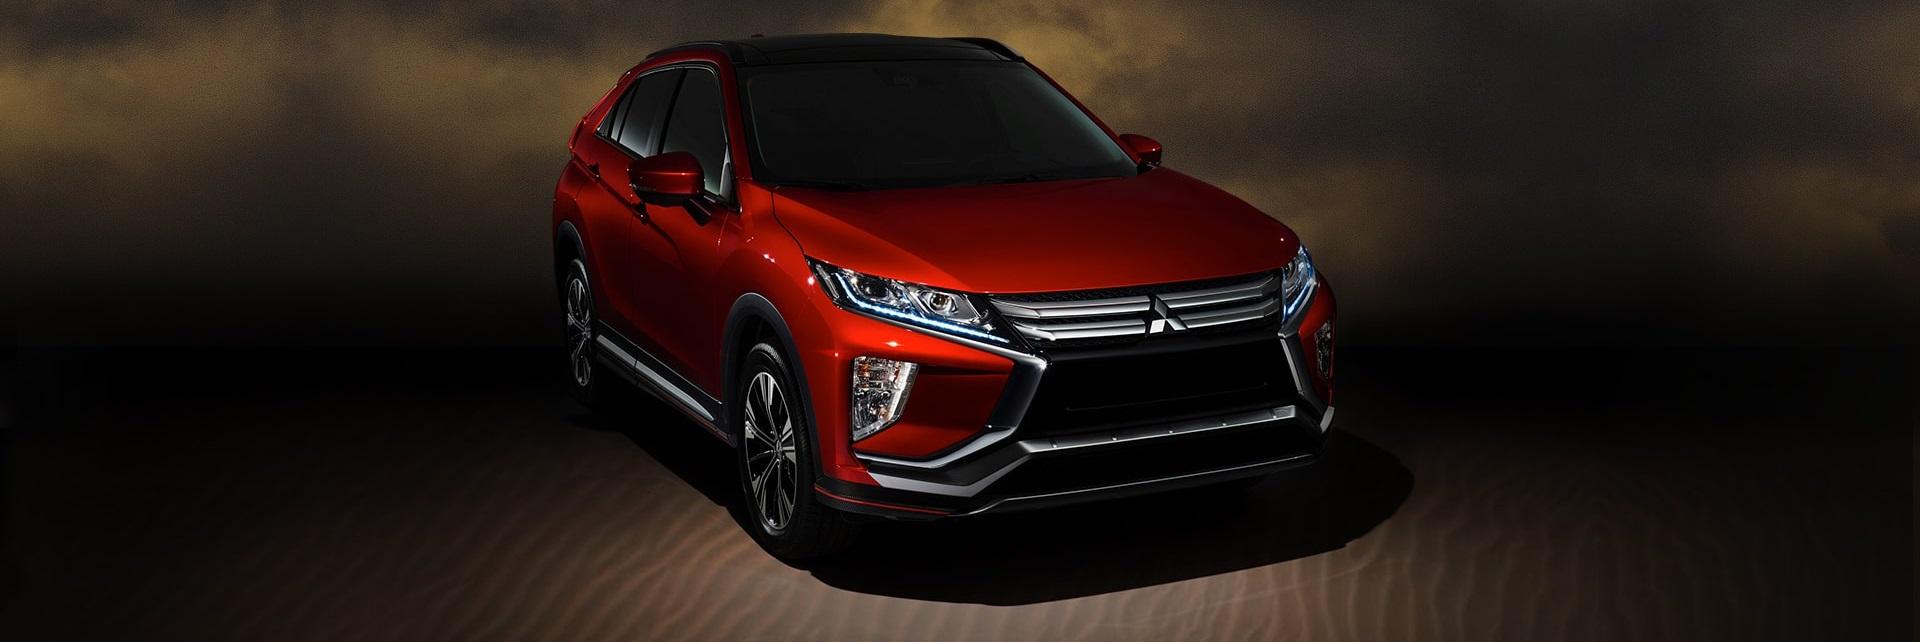 Mitsubishi Motors Introduces New Flagship PHEV